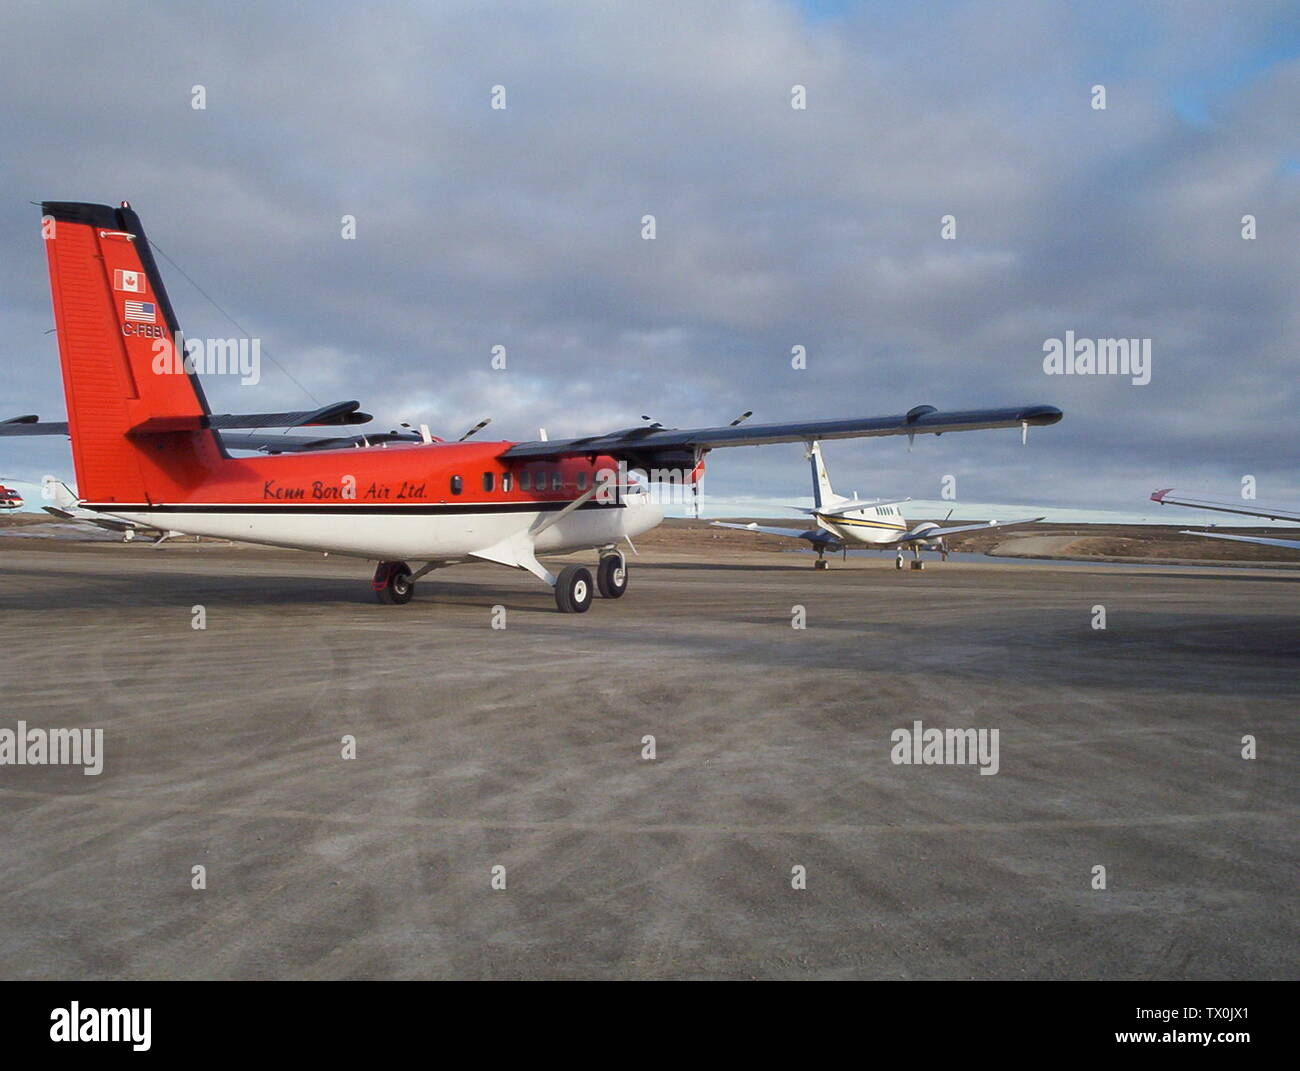 'English: C-FBBV Kenn Borek Air Ltd. de Havilland Twin Otter (DHC-6) 300 Series at Cambridge Bay Airport, Nunavut, Canada; 17 June 2005, 22:12 MDT (18 June 2005, 04:12 UTC); Own work; CambridgeBayWeather; ' - Stock Image